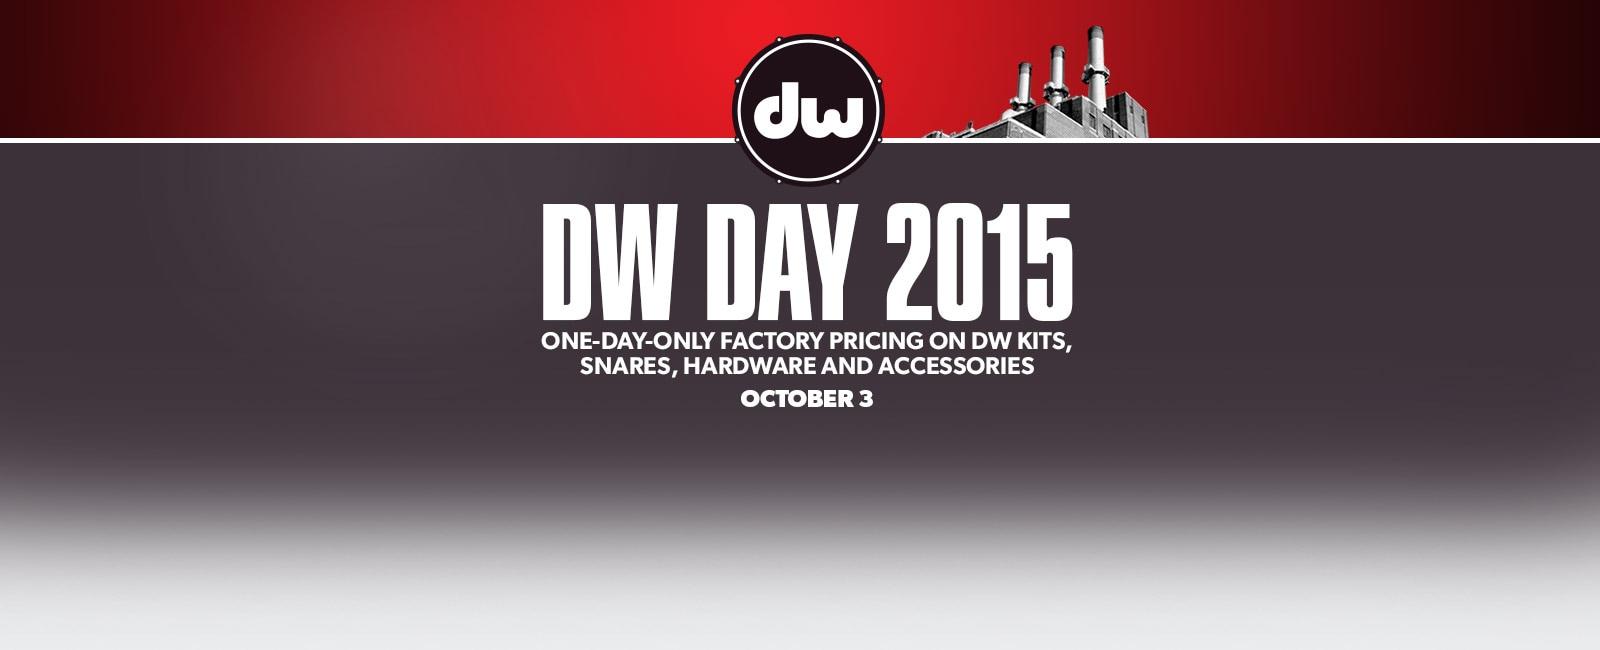 DW Day